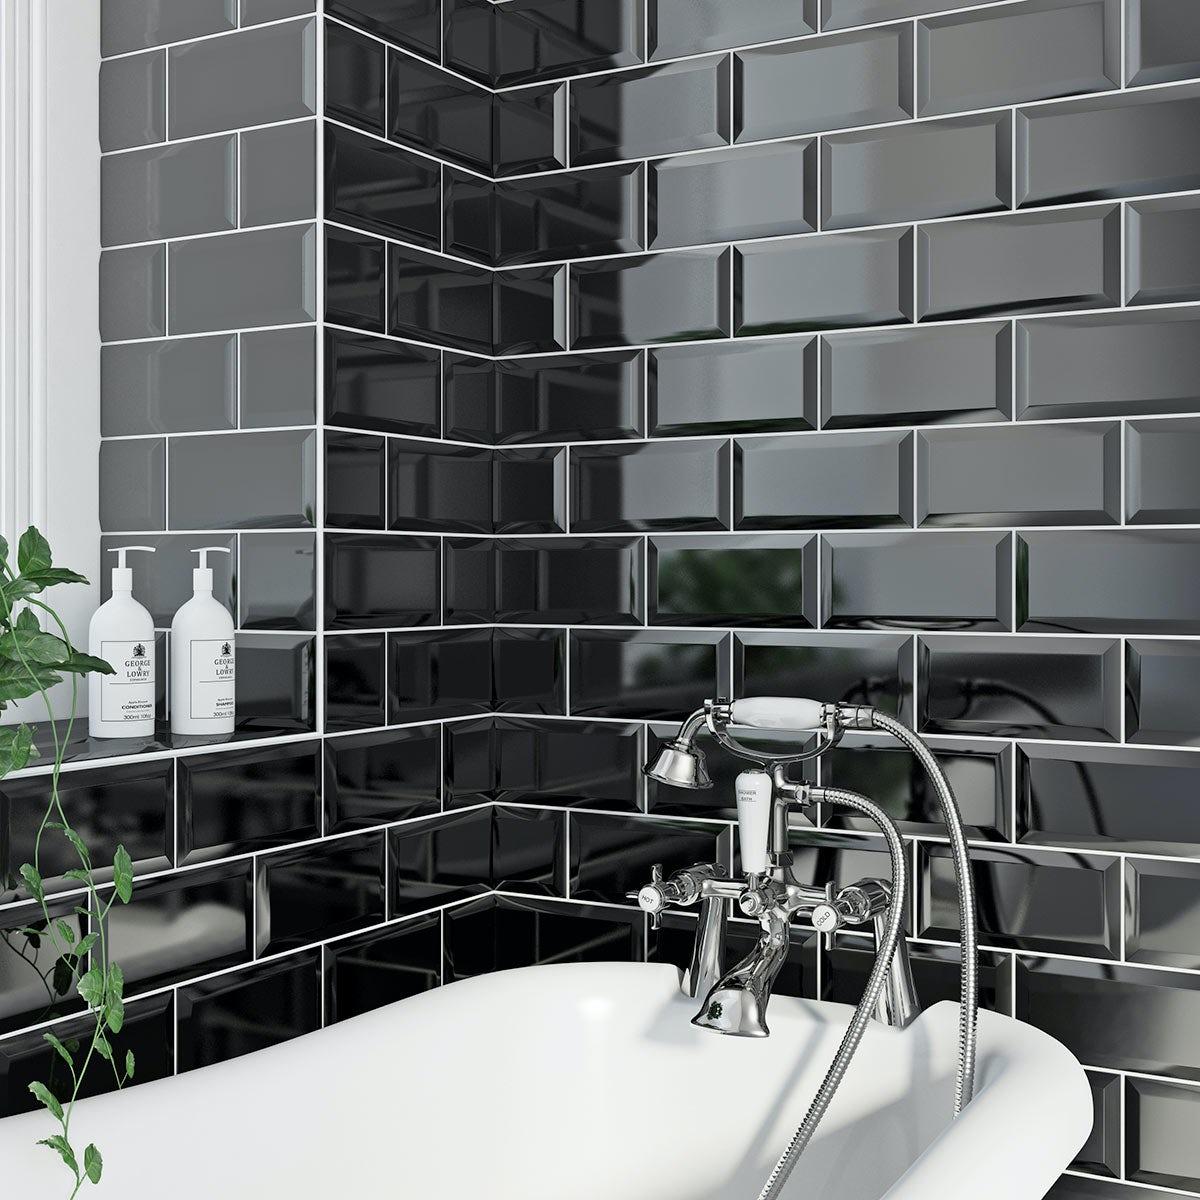 British ceramic tile metro bevel black gloss tile 100mm x 200mm british ceramic tile metro bevel black gloss tile 100mm x 200mm dailygadgetfo Images